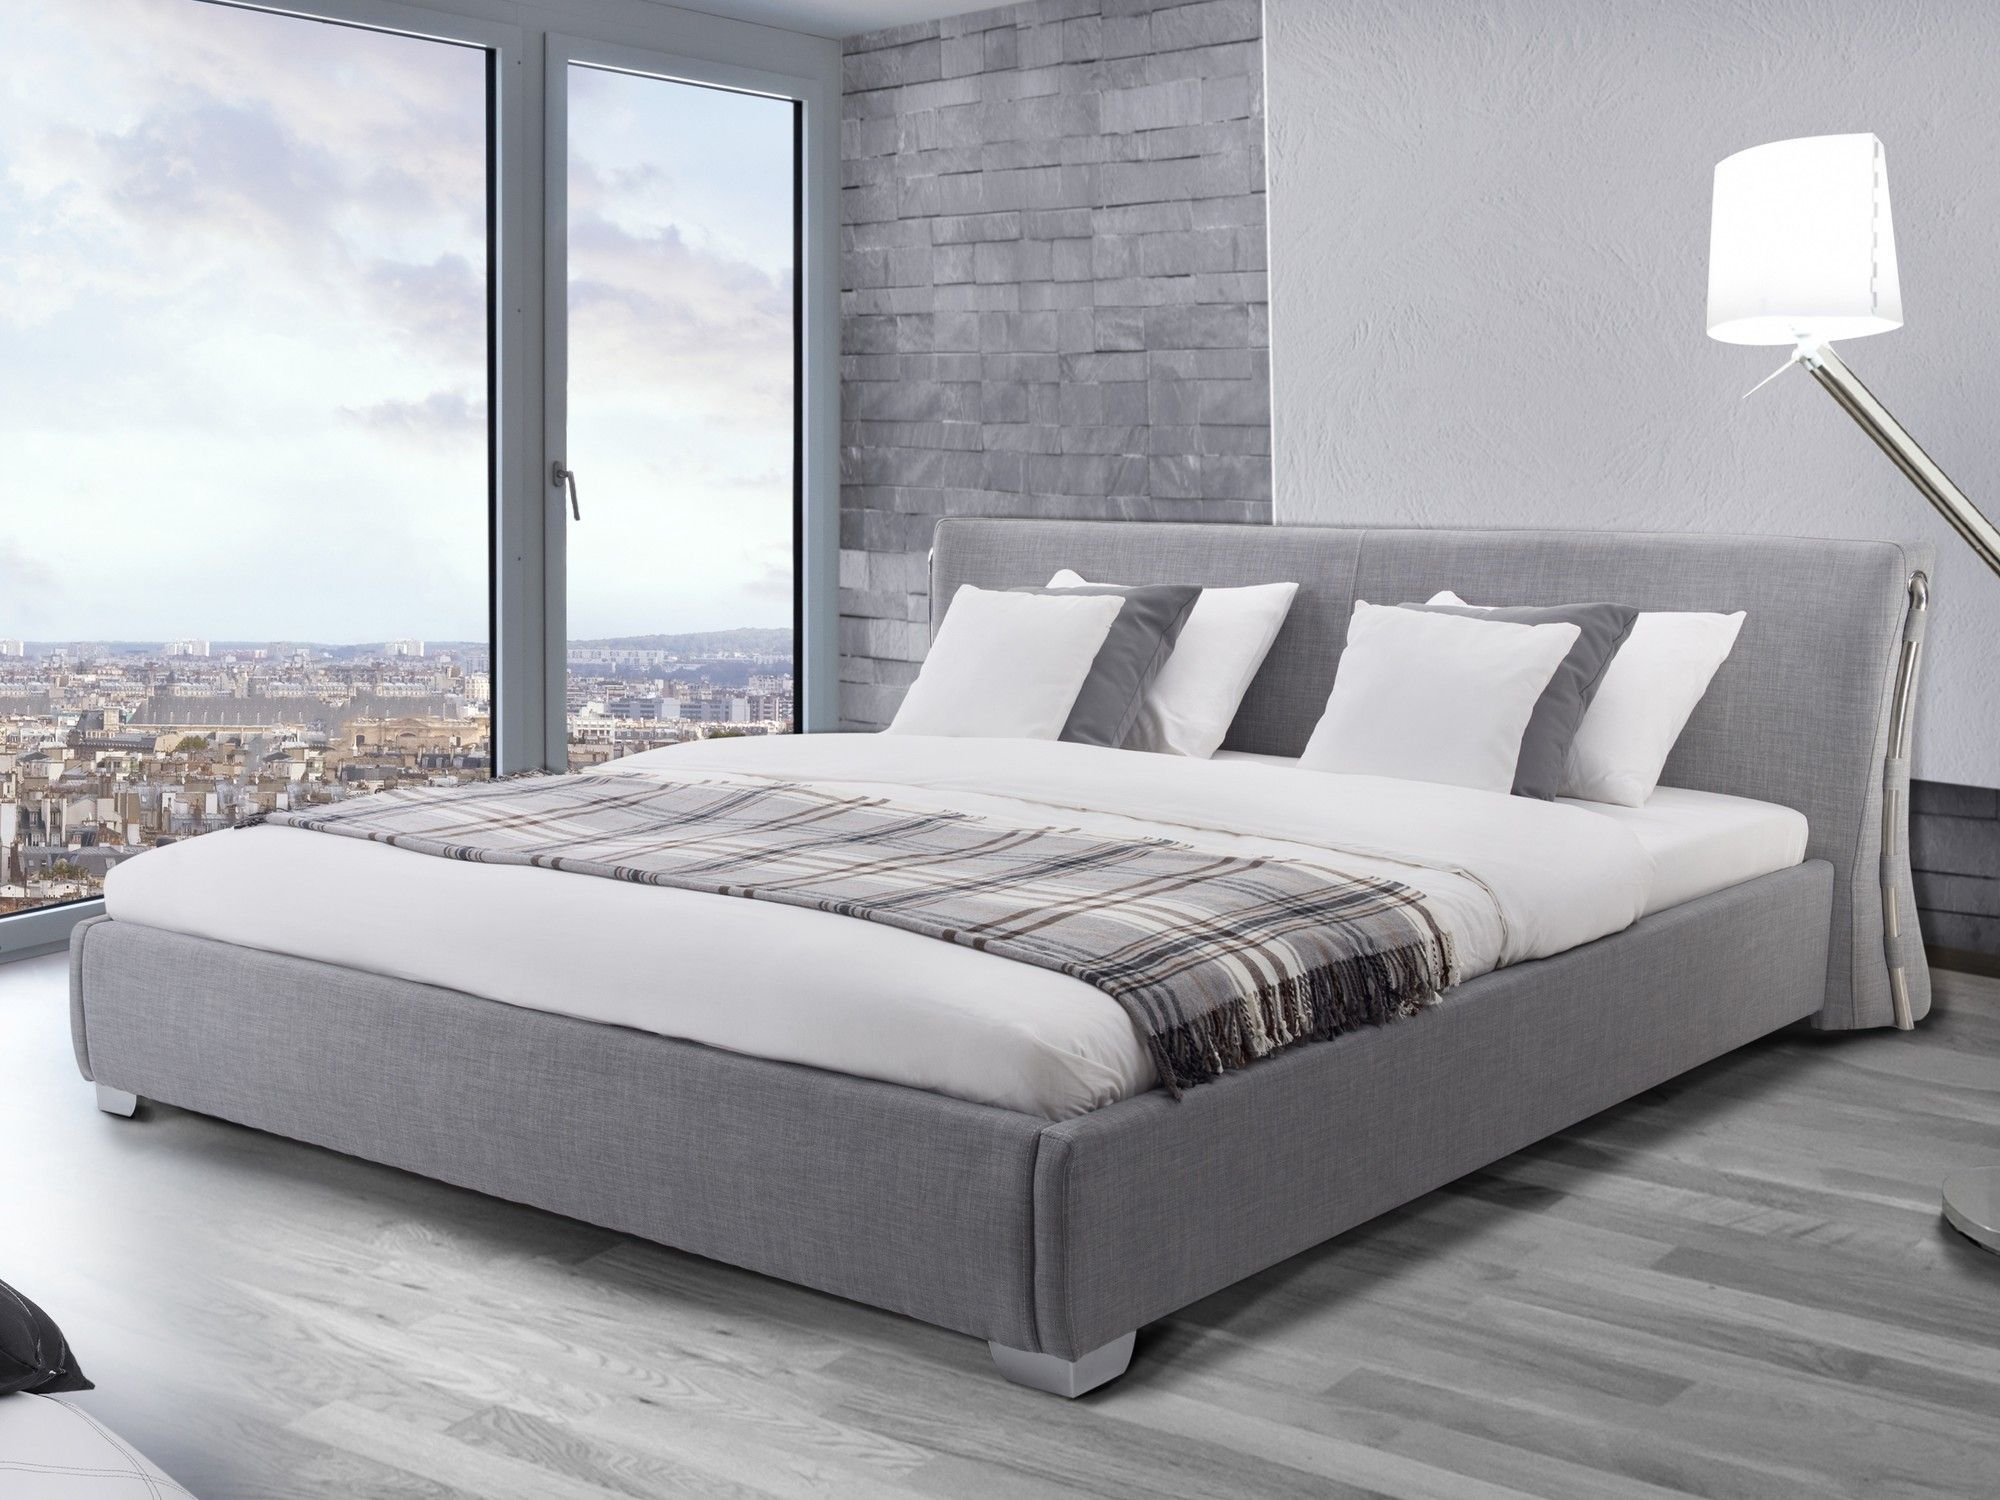 Shop Wayfair Co Uk For Your Caloote King Upholstered Bed Frame